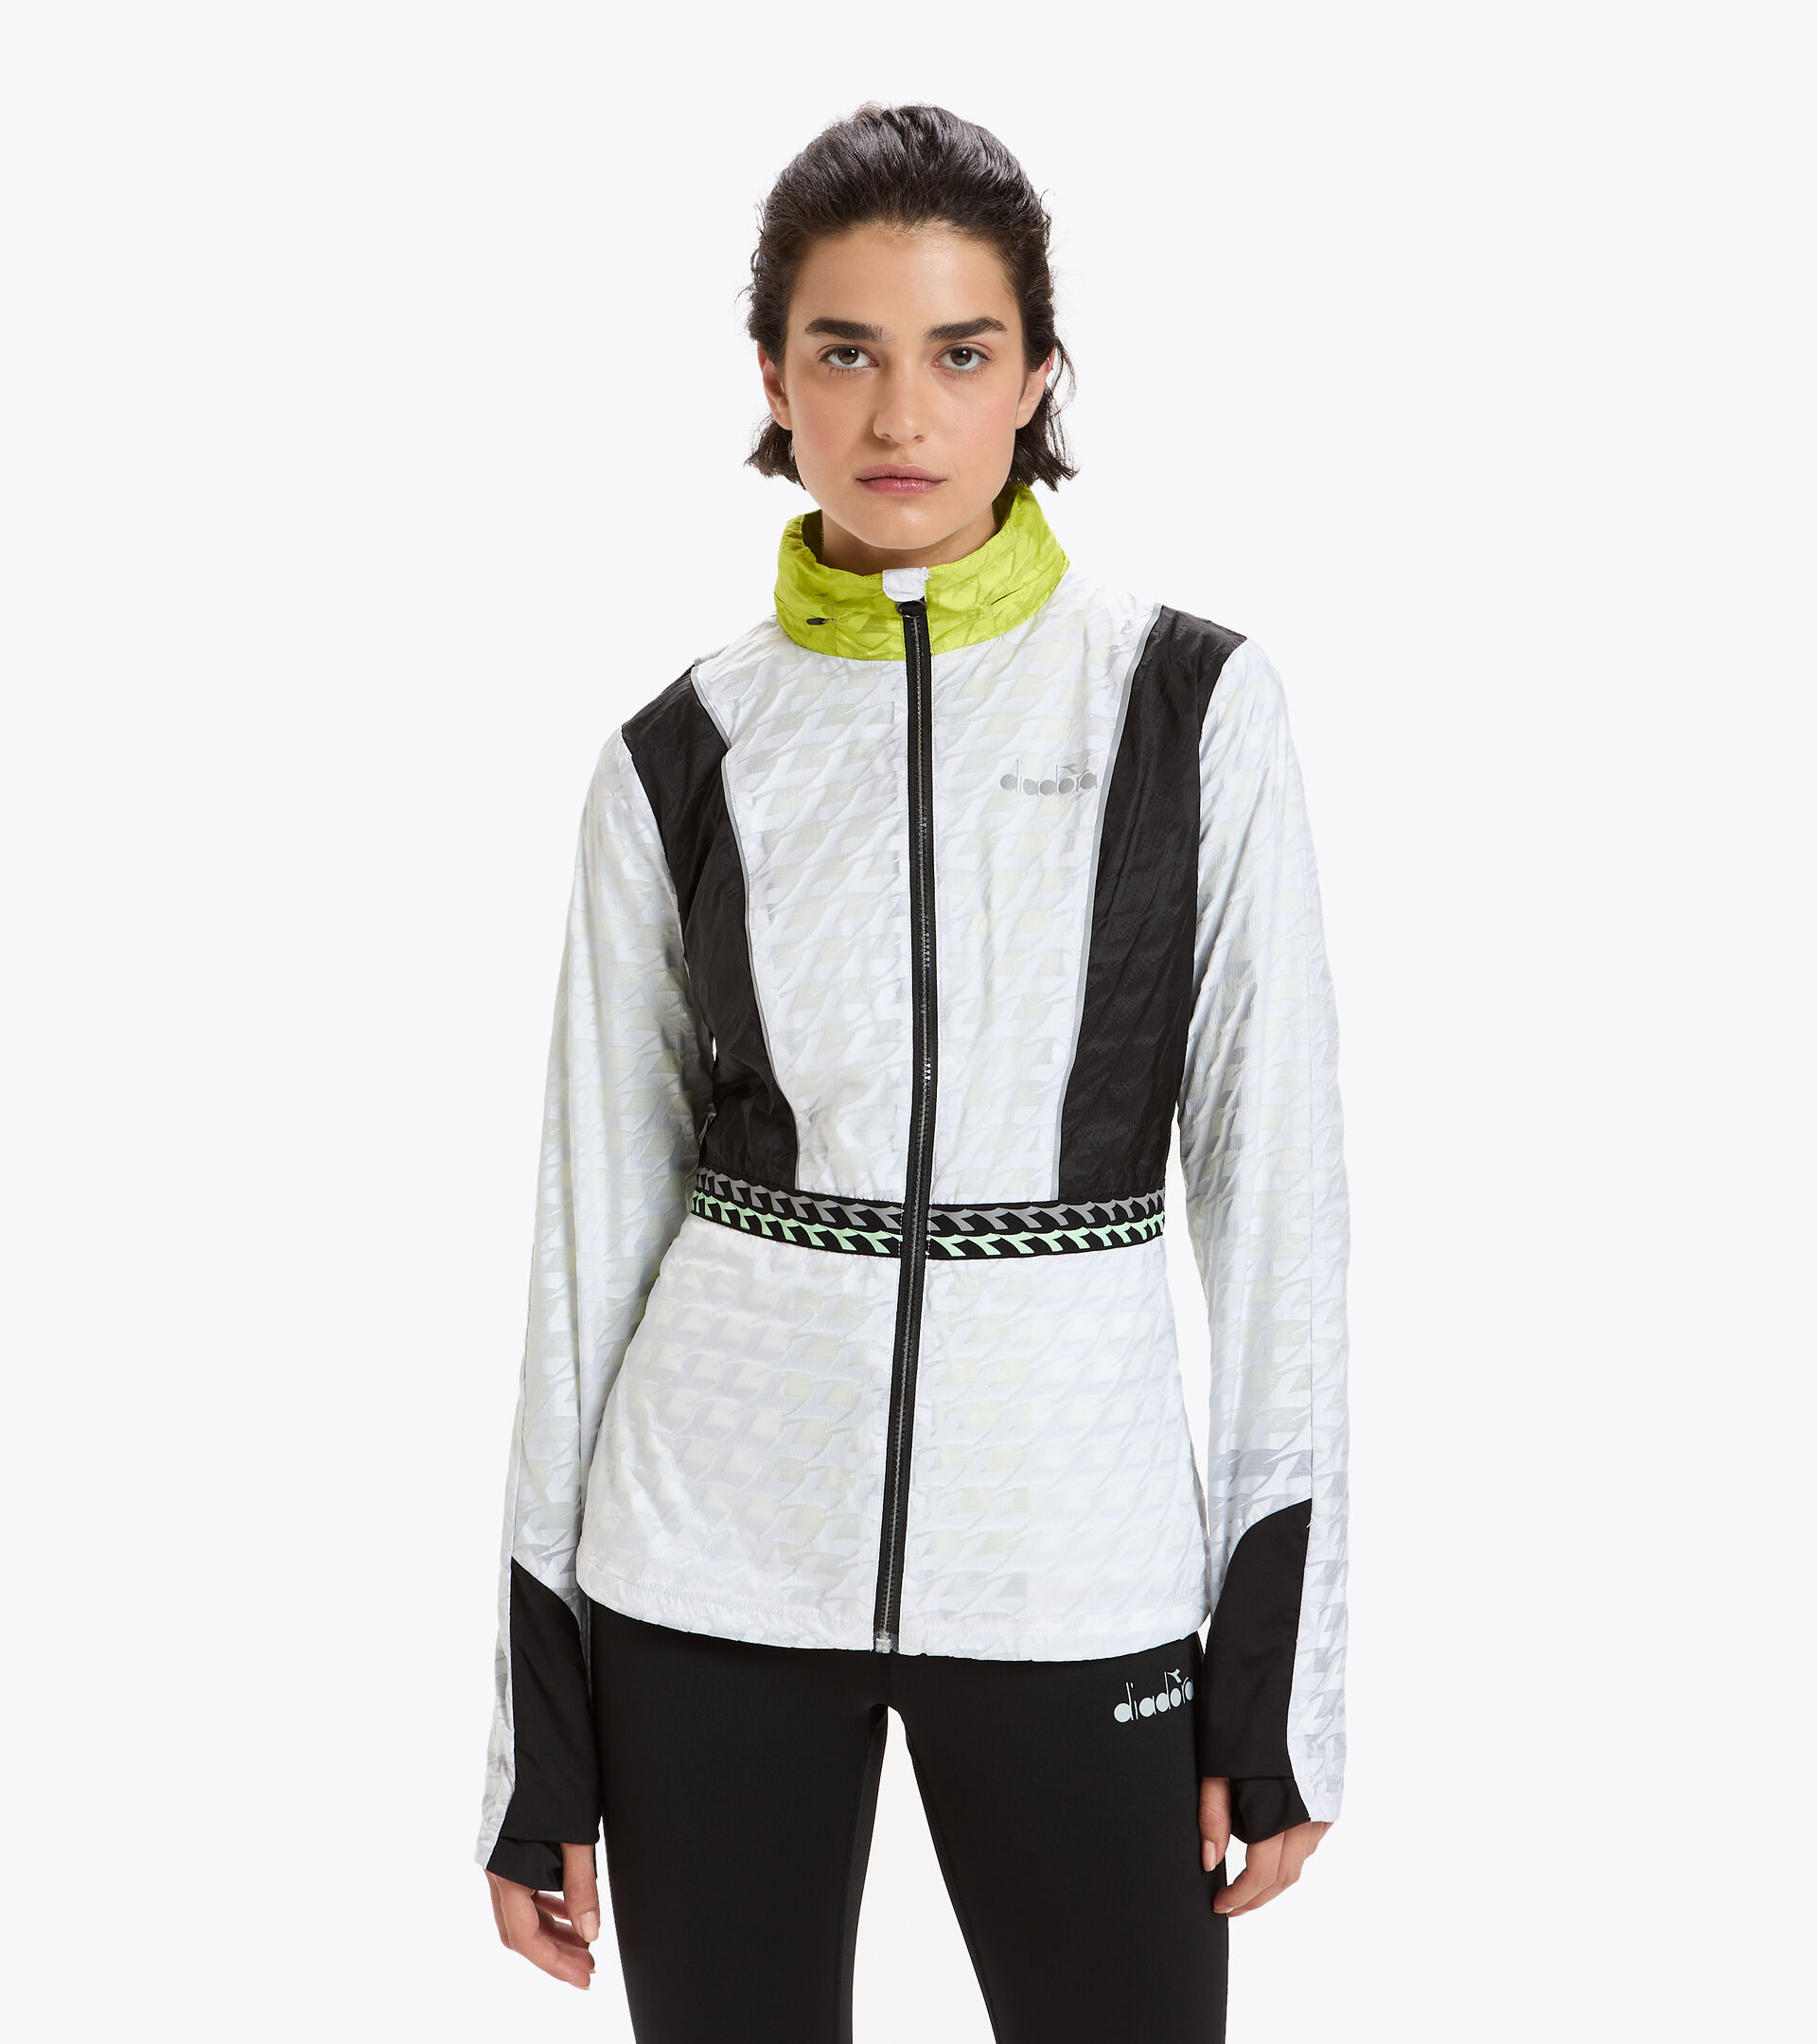 Isothermal running jacket - Women L. ISOTHERMAL JACKET BE ONE OPTICAL WHITE - Diadora